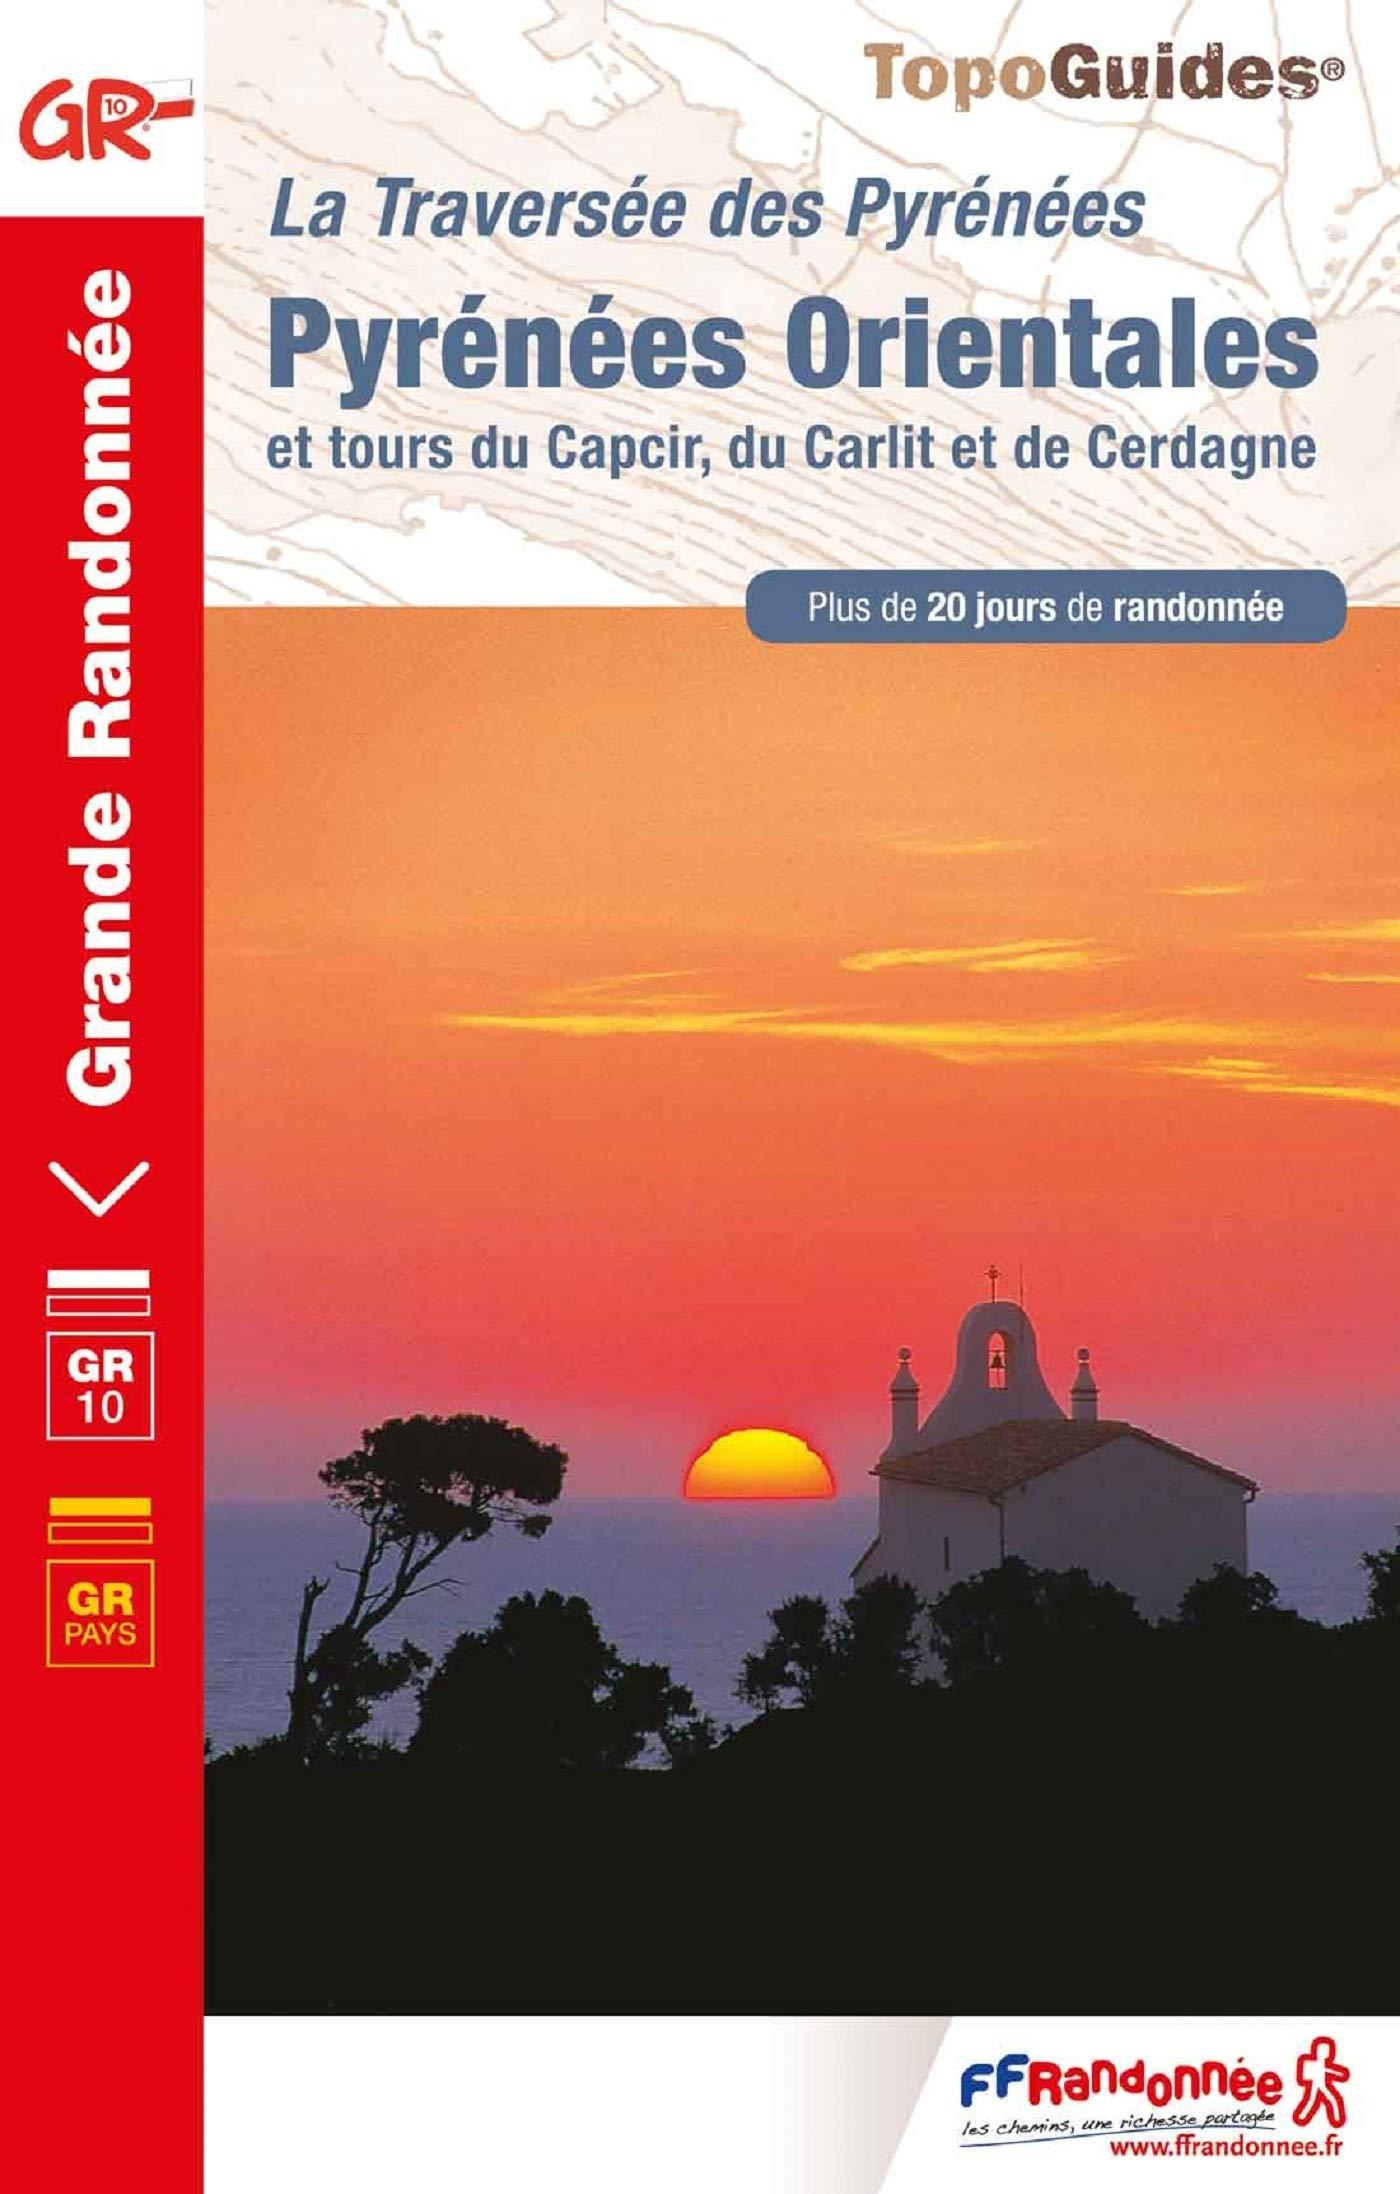 TG1092  Pyrénées Orientales | wandelgids GR-10 9782751410208  FFRP Topoguides  Meerdaagse wandelroutes, Wandelgidsen Franse Pyreneeën, Toulouse, Gers, Garonne